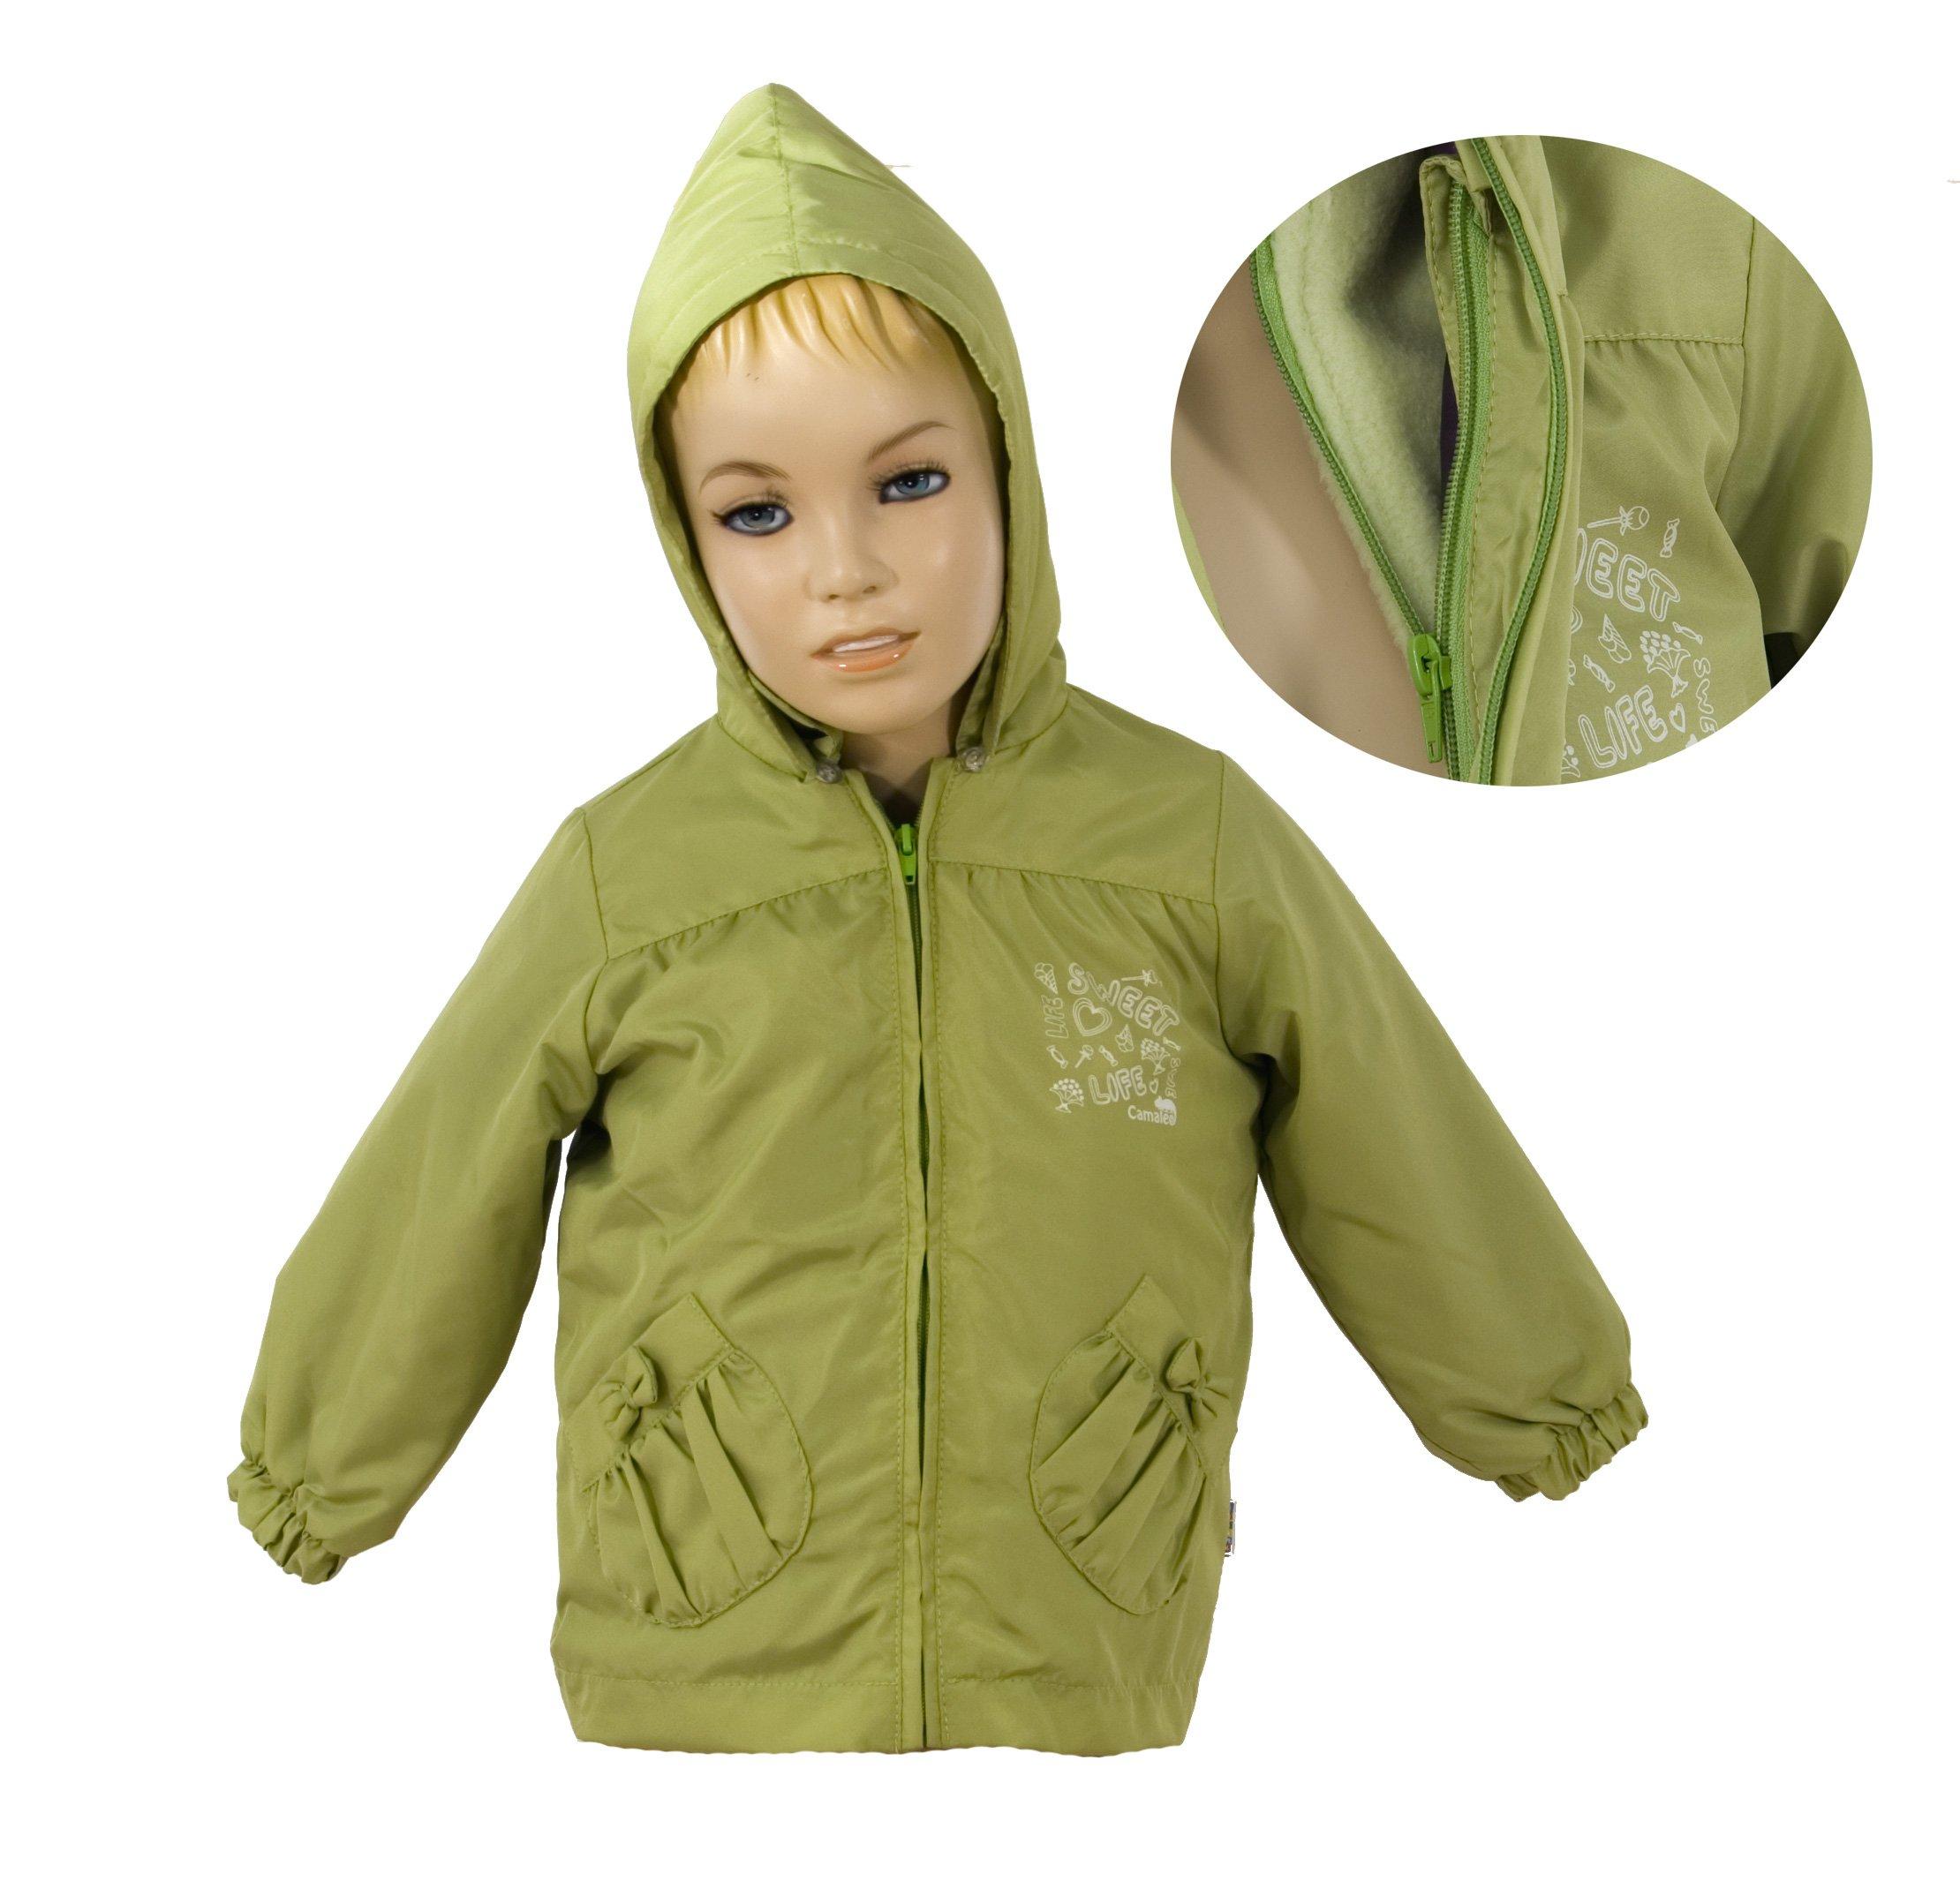 Bunda 3 v 1 s vnit�n� fleece vlo�kou a kapuc� zelen� velikost 98 - V�PRODEJ